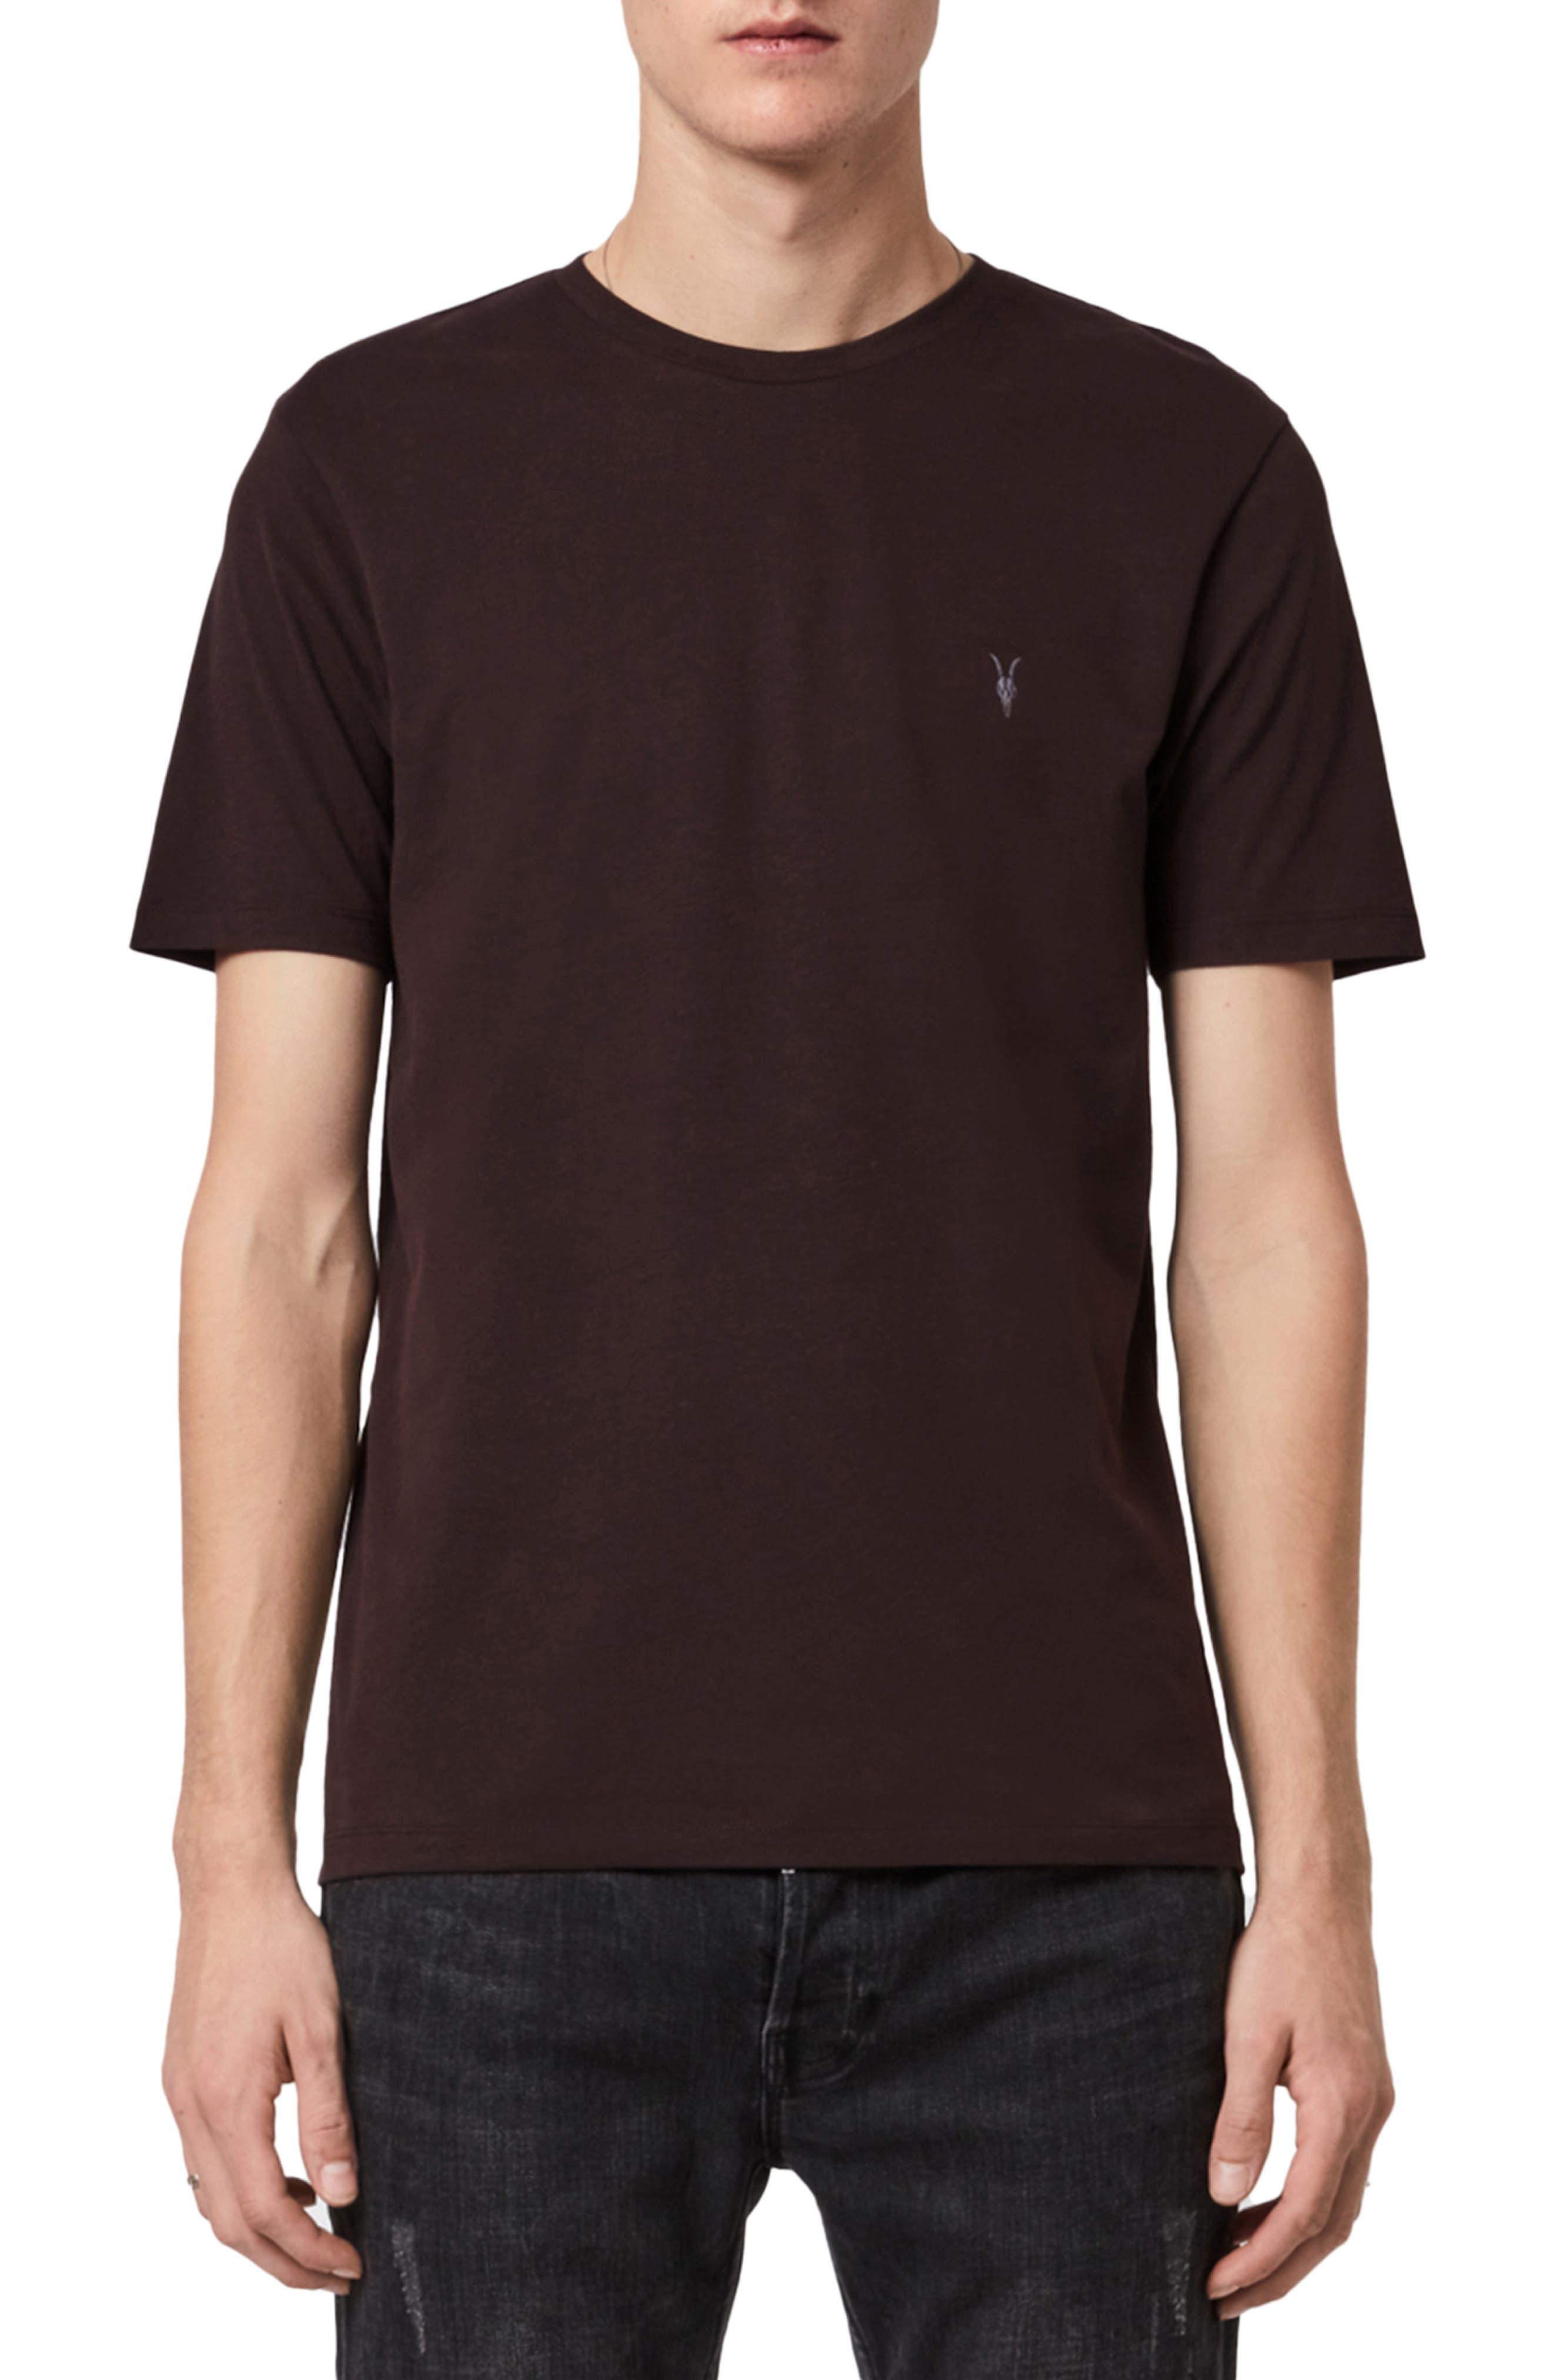 Brace Tonic Slim Fit Crewneck T-Shirt